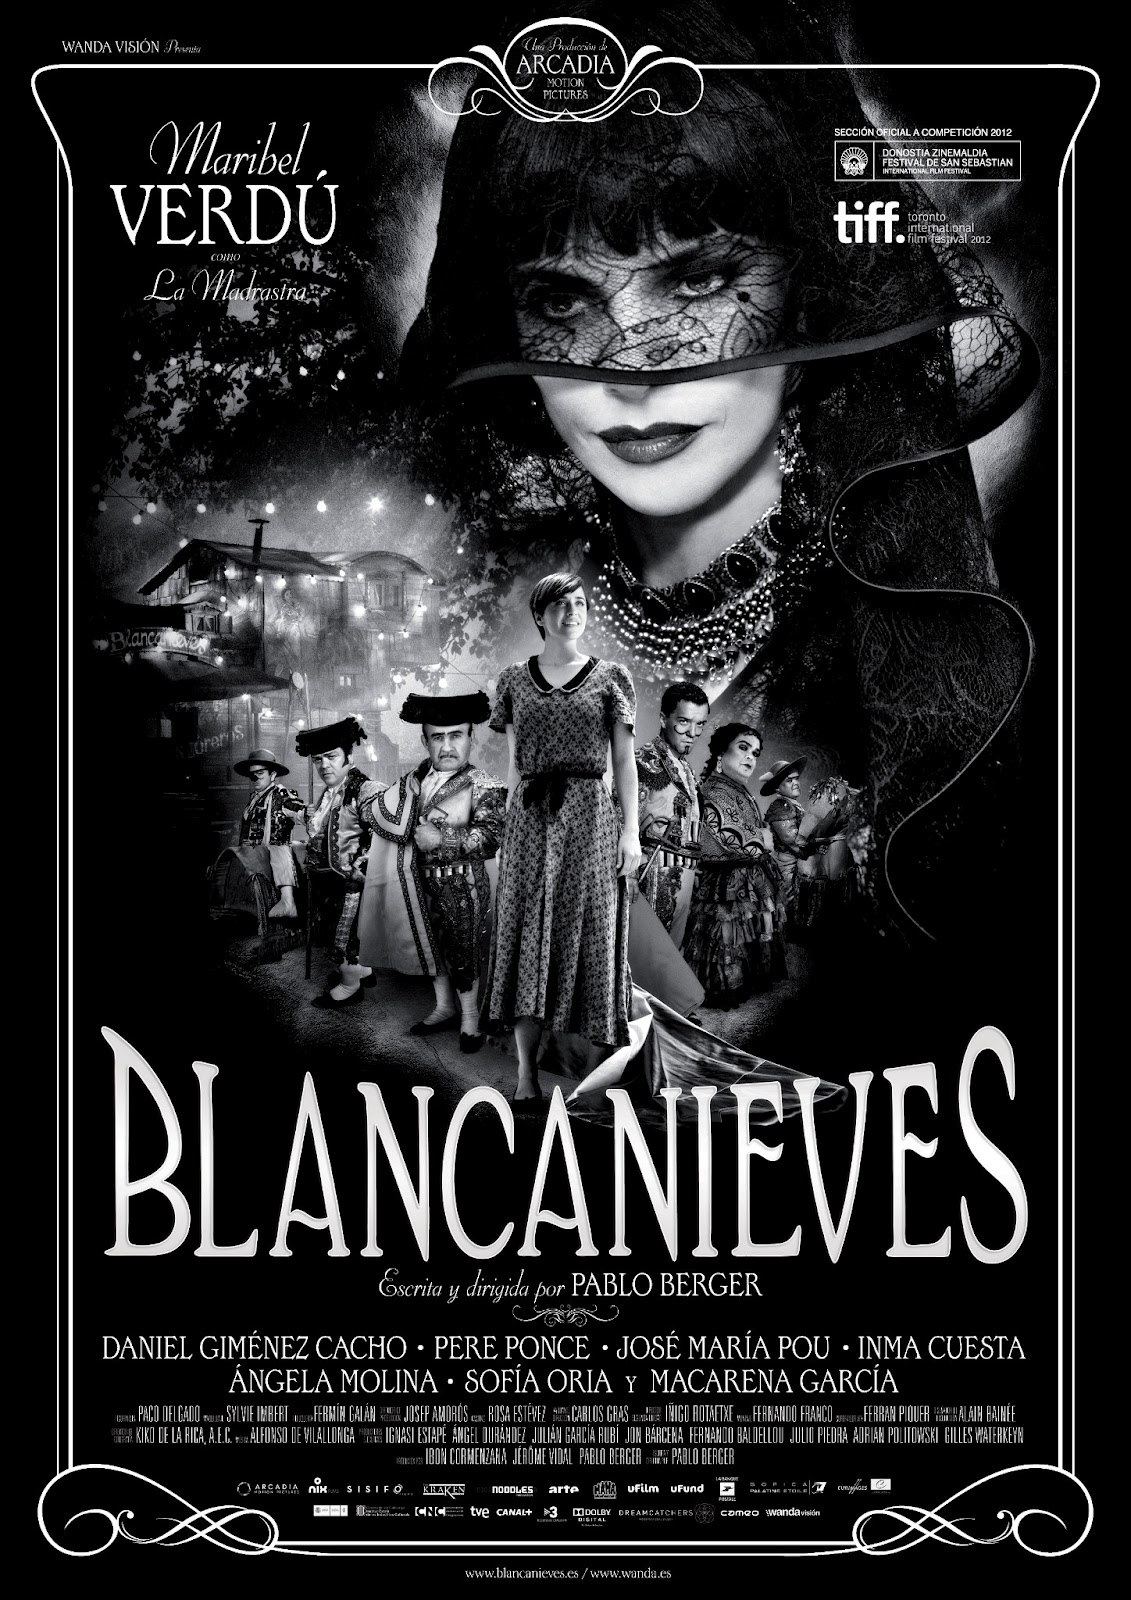 http://1.bp.blogspot.com/-C3CPy73E7mw/UPsNRZxKT3I/AAAAAAAAIS8/iyOktH95Fgc/s1600/Blancanieves.jpg